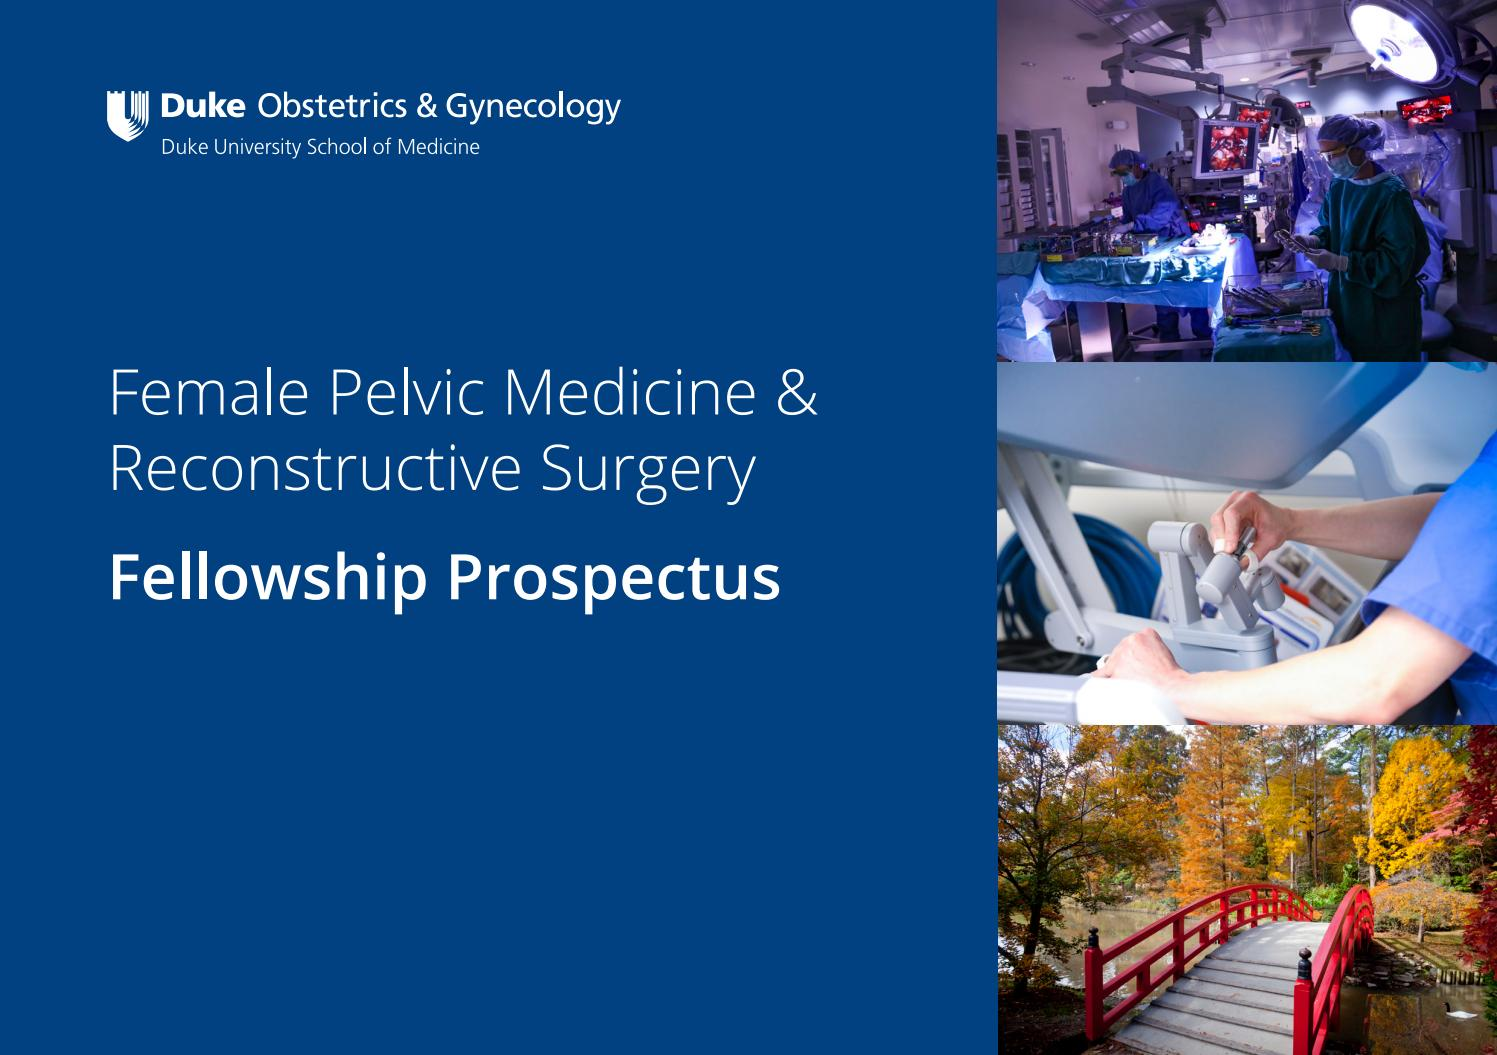 Duke Ob/Gyn FPMRS Fellowship Prospectus by dukeobgyn - issuu